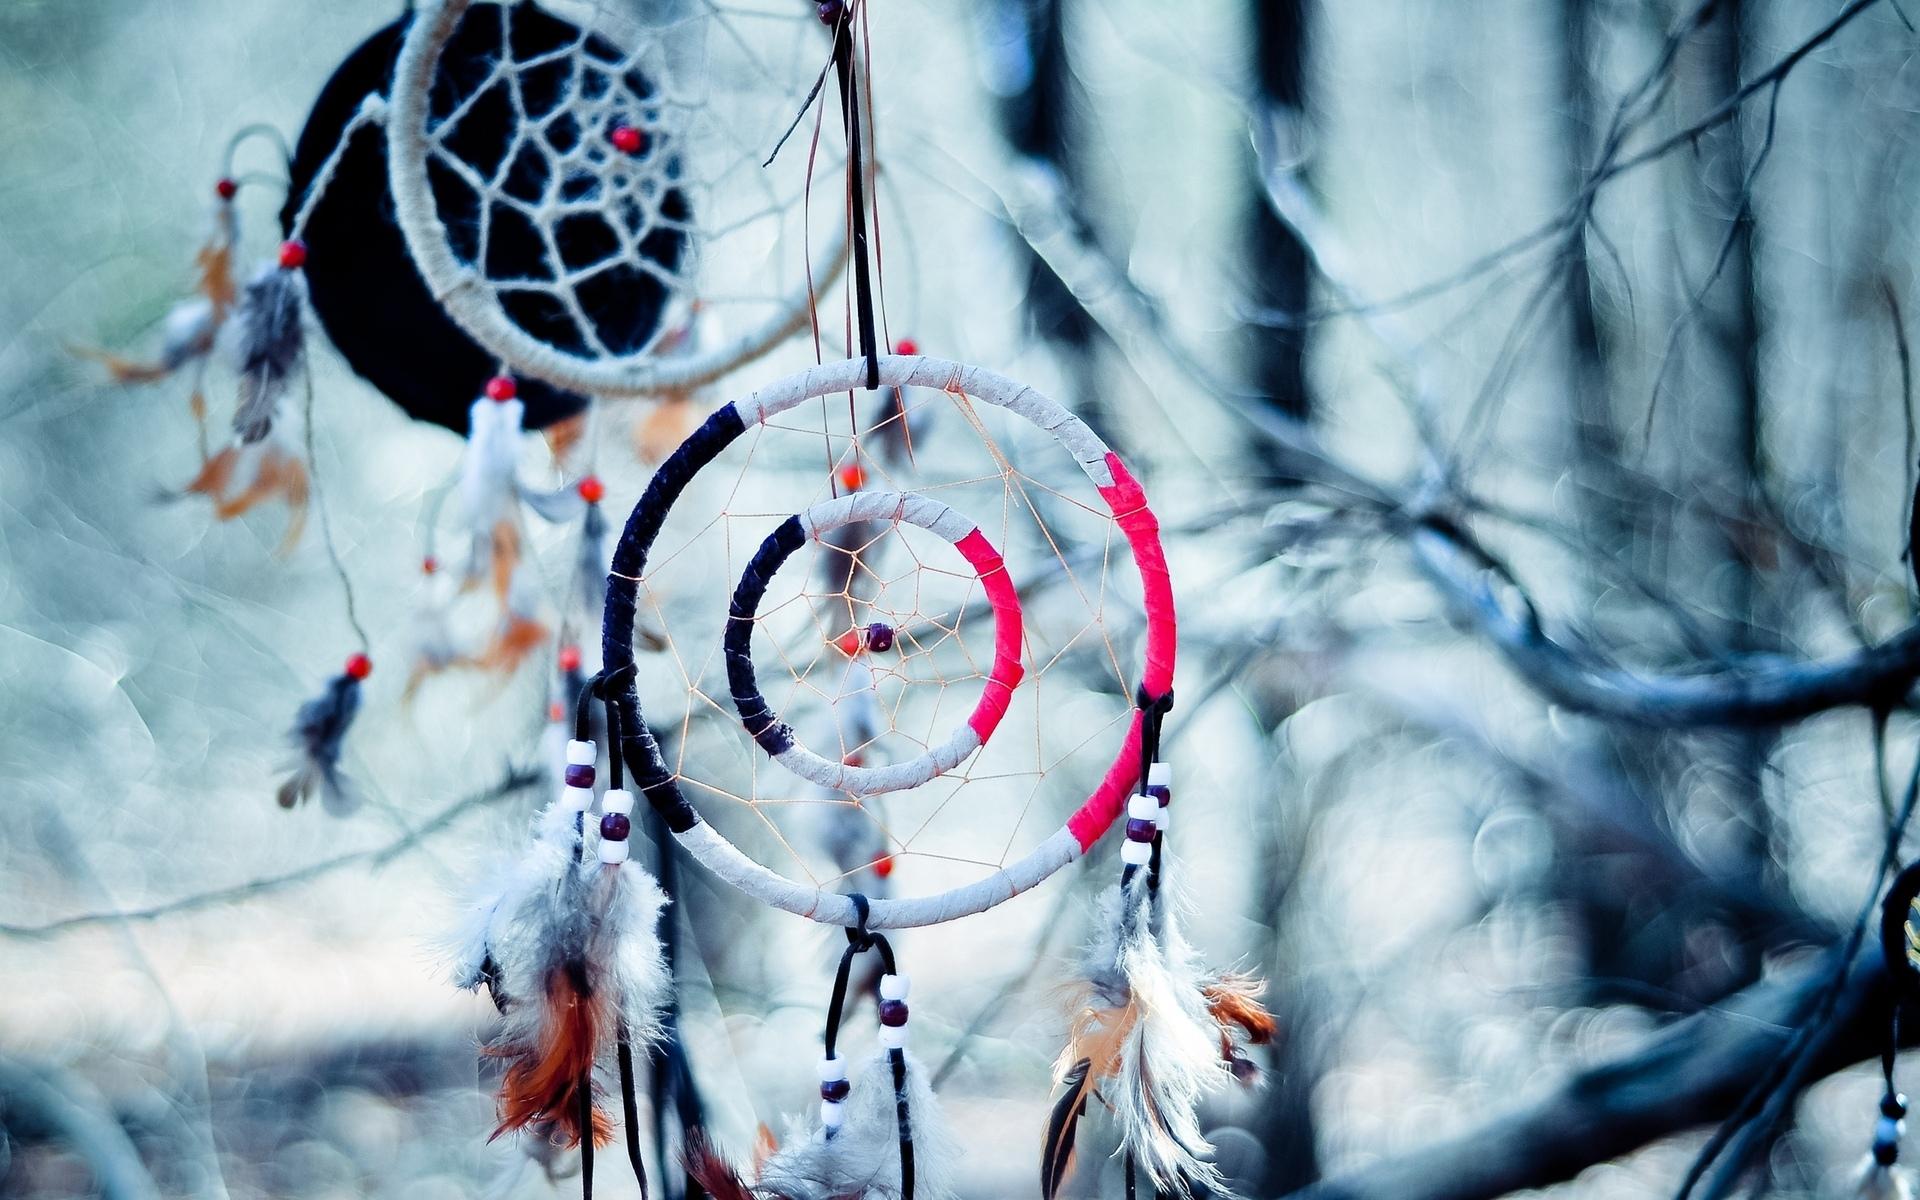 Dream Catcher native american artistic indian trees branch limb 1920x1200